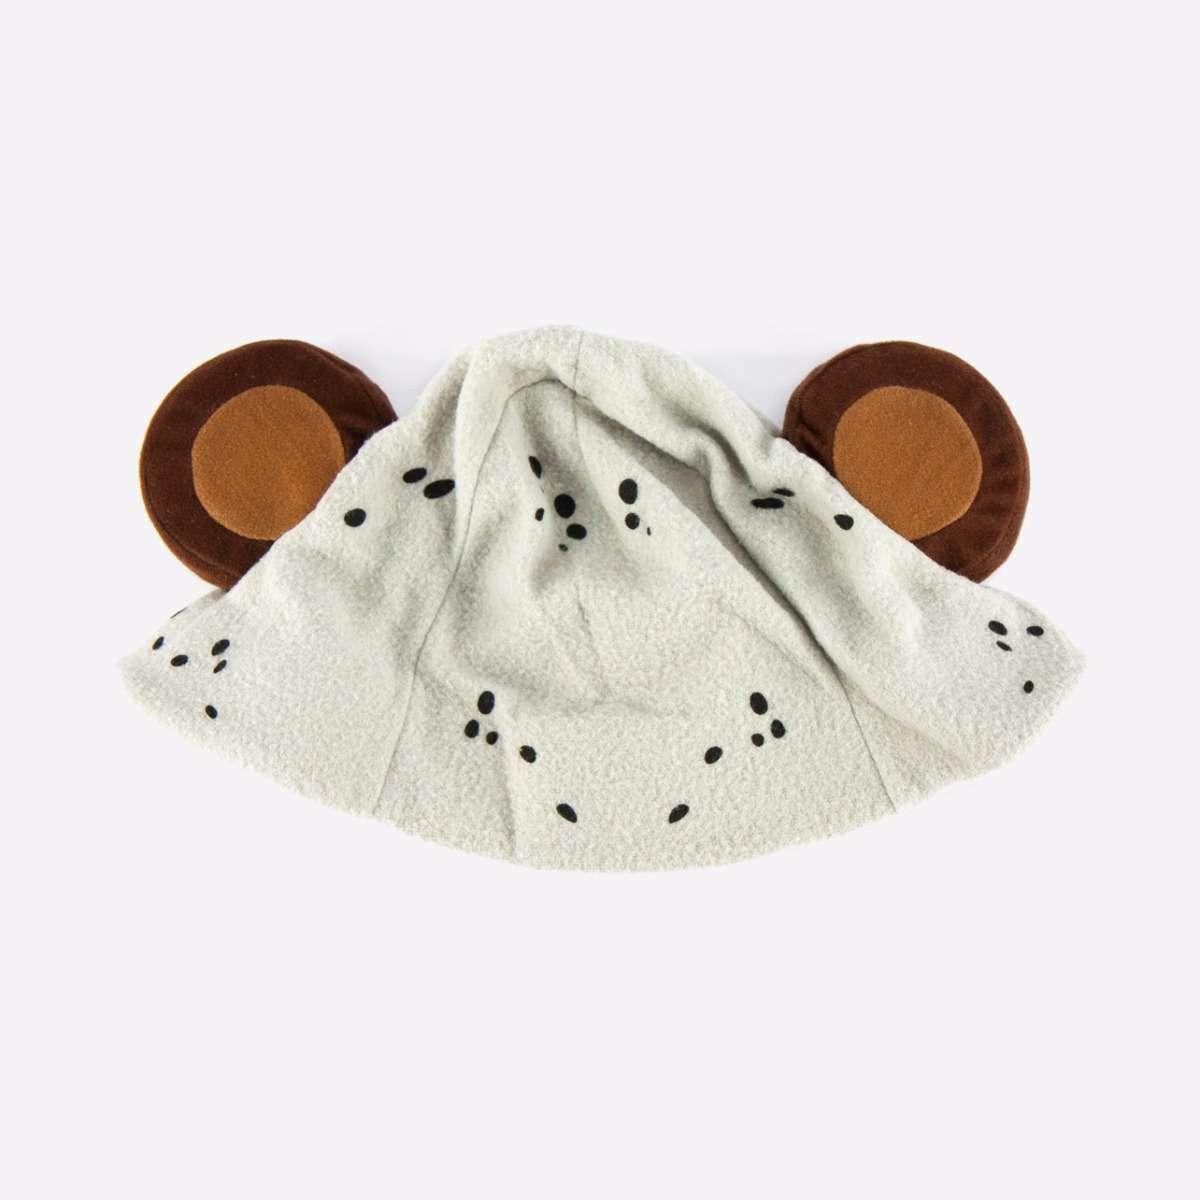 Bartholomew's Hat apparel